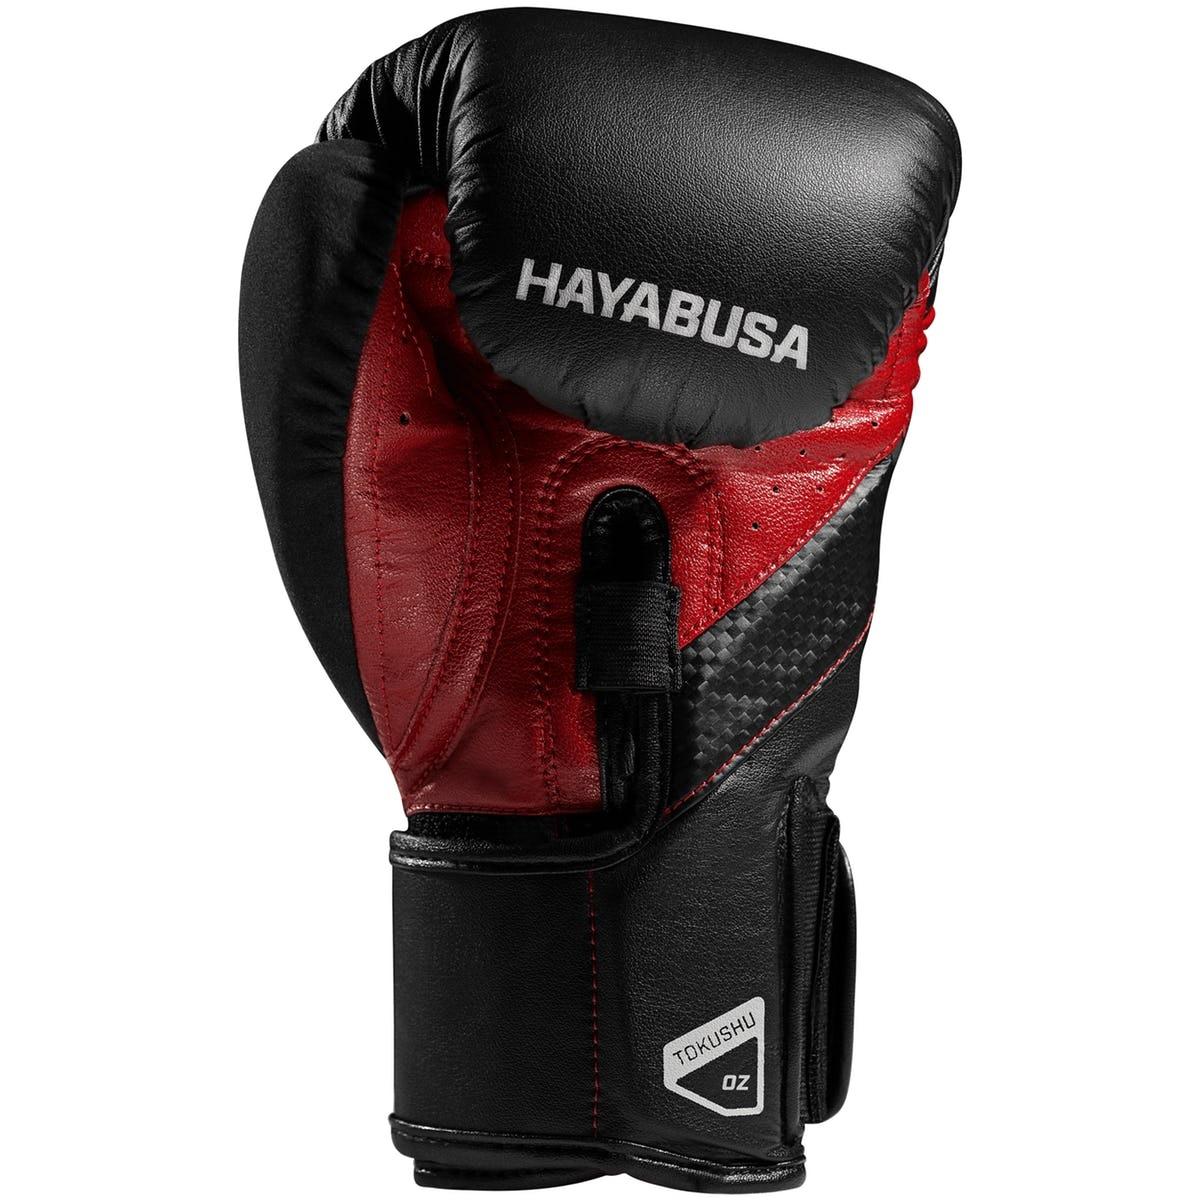 Hayabusa-T3-Dual-X-Hook-and-Loop-Closure-Vylar-Leather-Training-Boxing-Gloves thumbnail 21